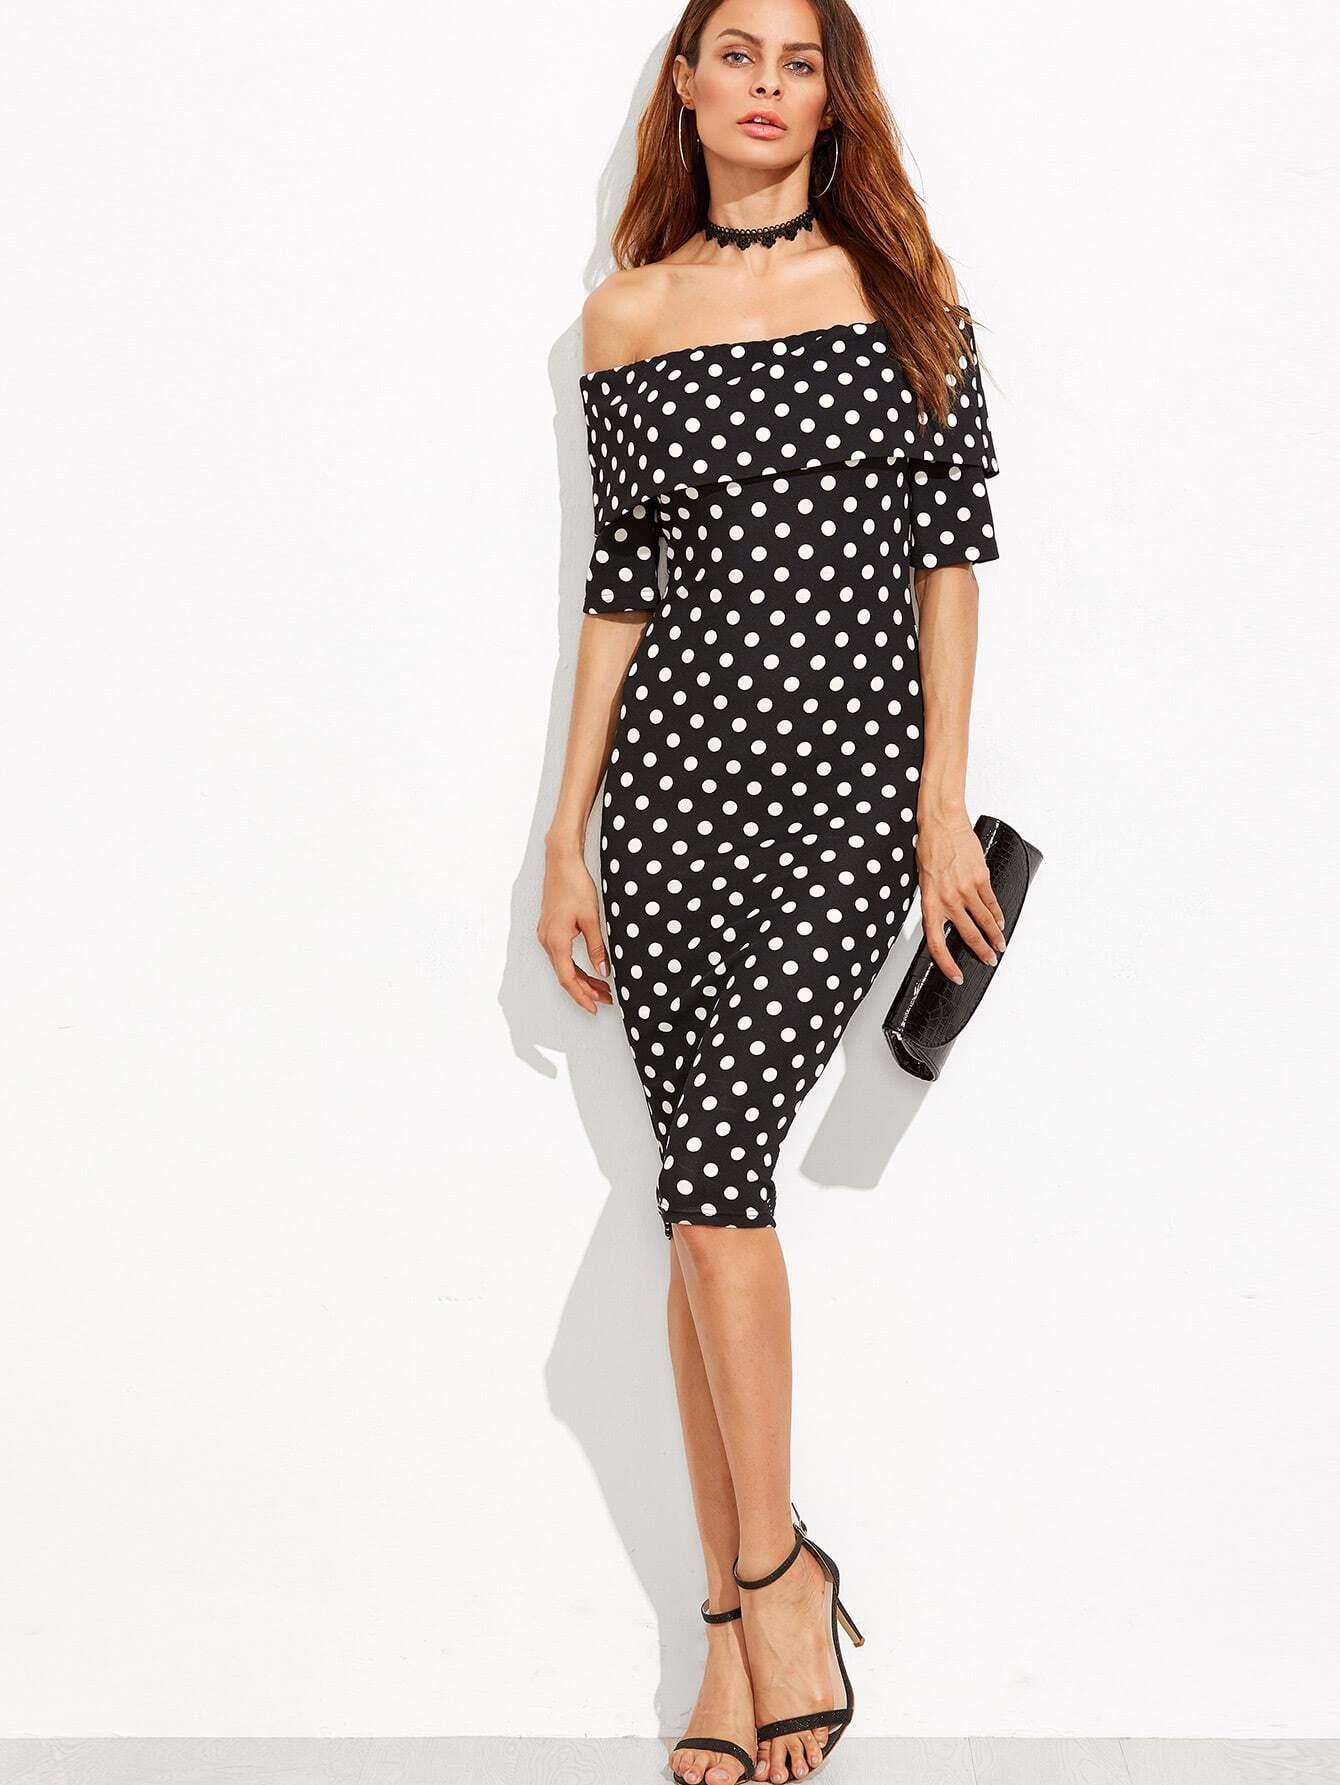 Black Polka Dot Print Foldover Off The Shoulder DressBlack Polka Dot Print Foldover Off The Shoulder Dress<br><br>color: Black and White<br>size: L,M,S,XS